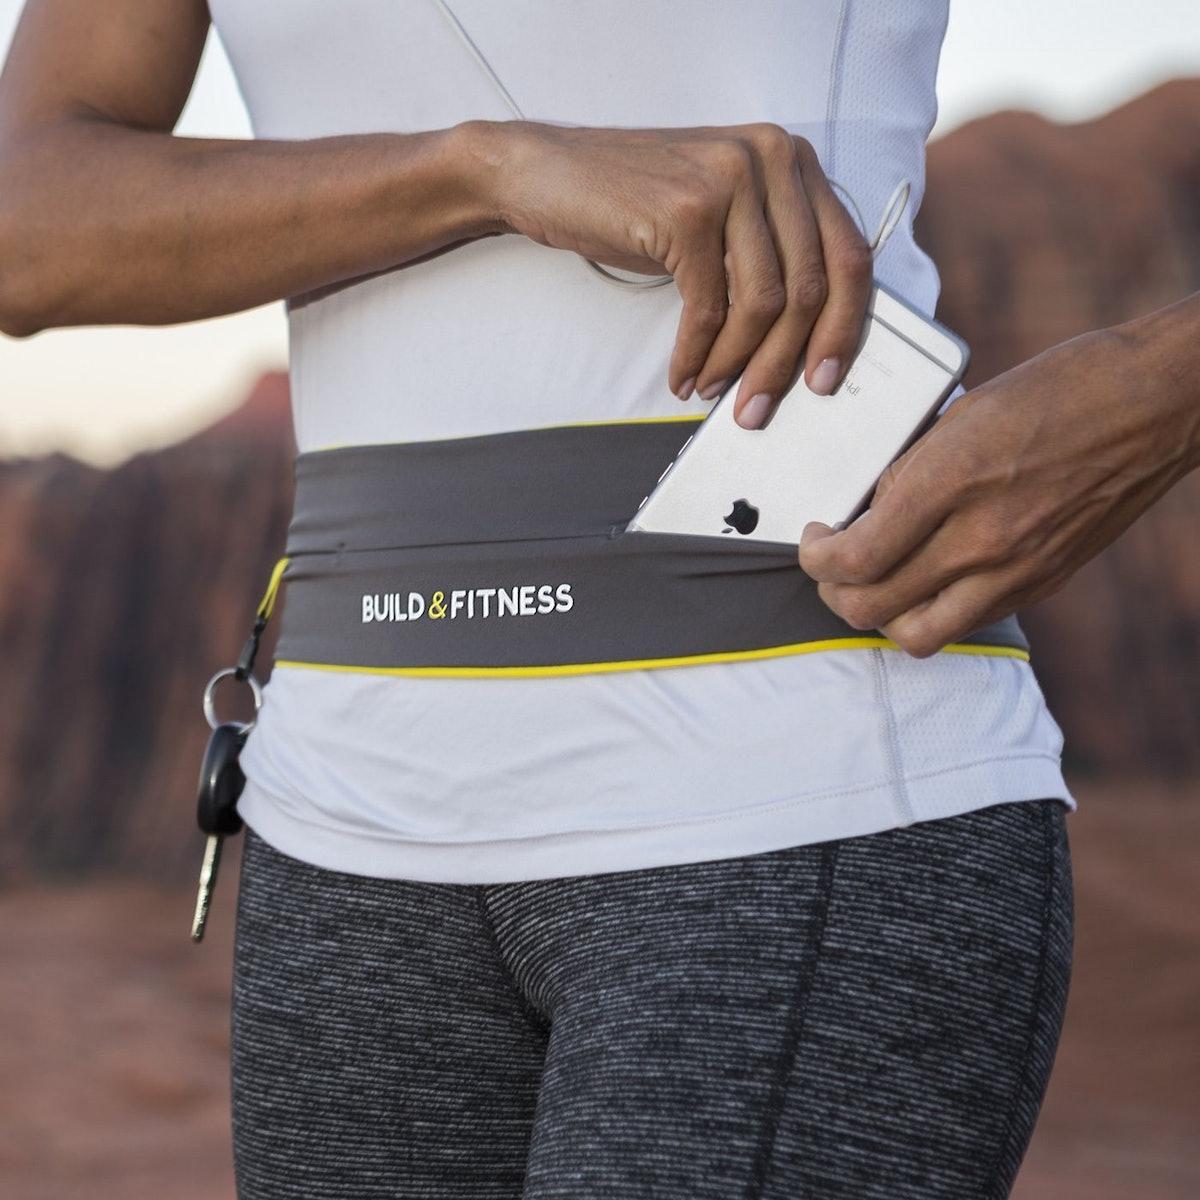 Build & Fitness Running Belt